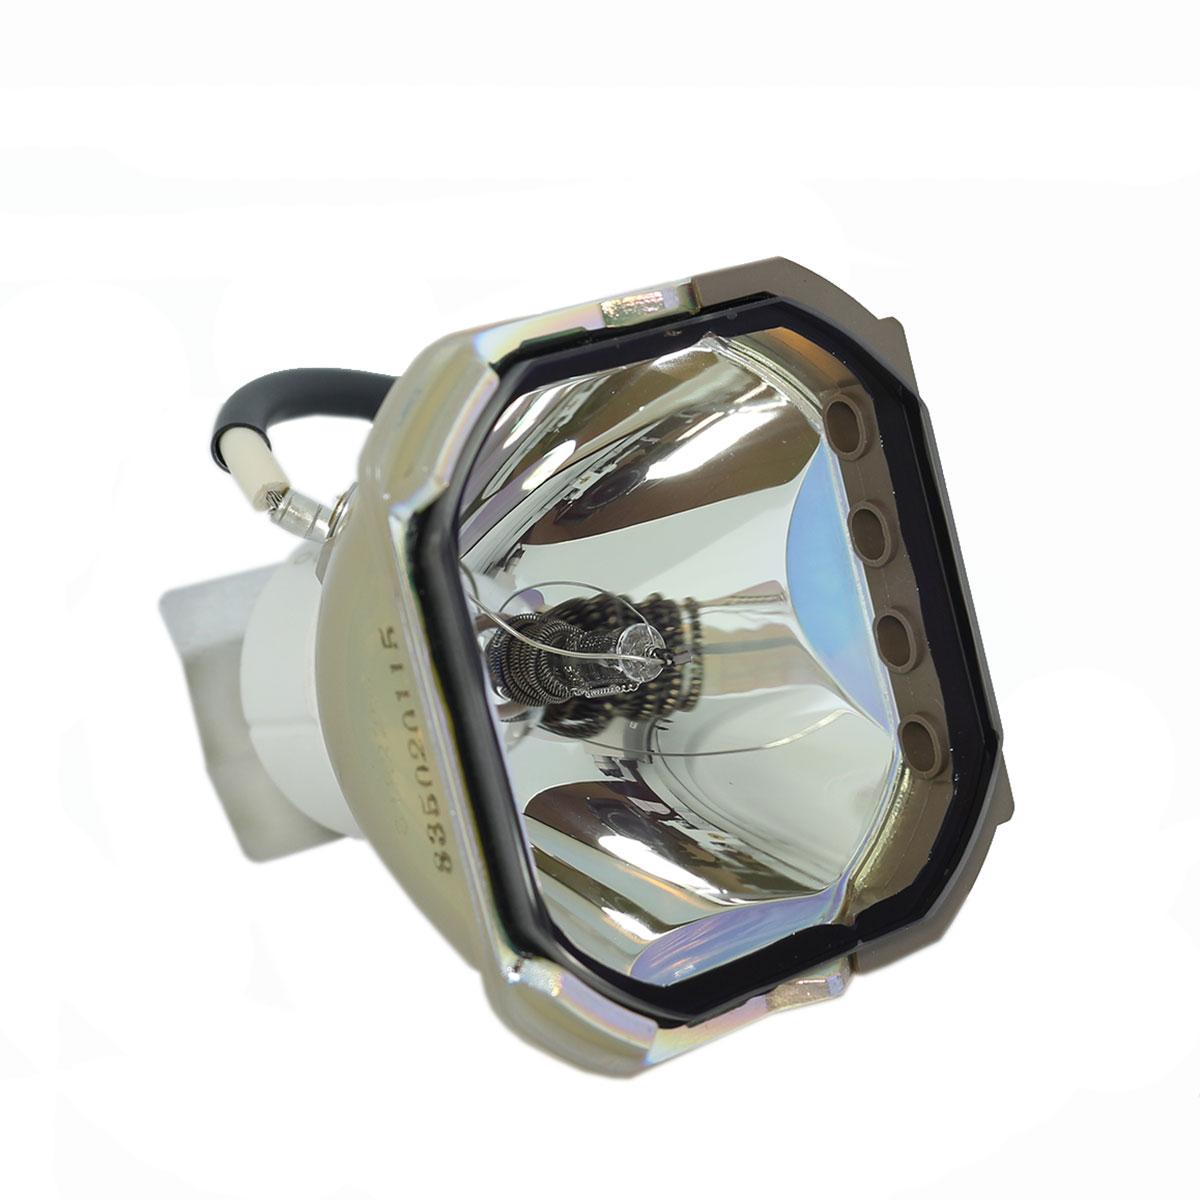 Compatible Bare Bulb TLPLX10 TLP-LX10 for Toshiba TLP-MT7 TLP-X20 TLP-X21 TLP-X21DE TLP-X20DE TLP-X11 Projector Lamp Bulb<br>